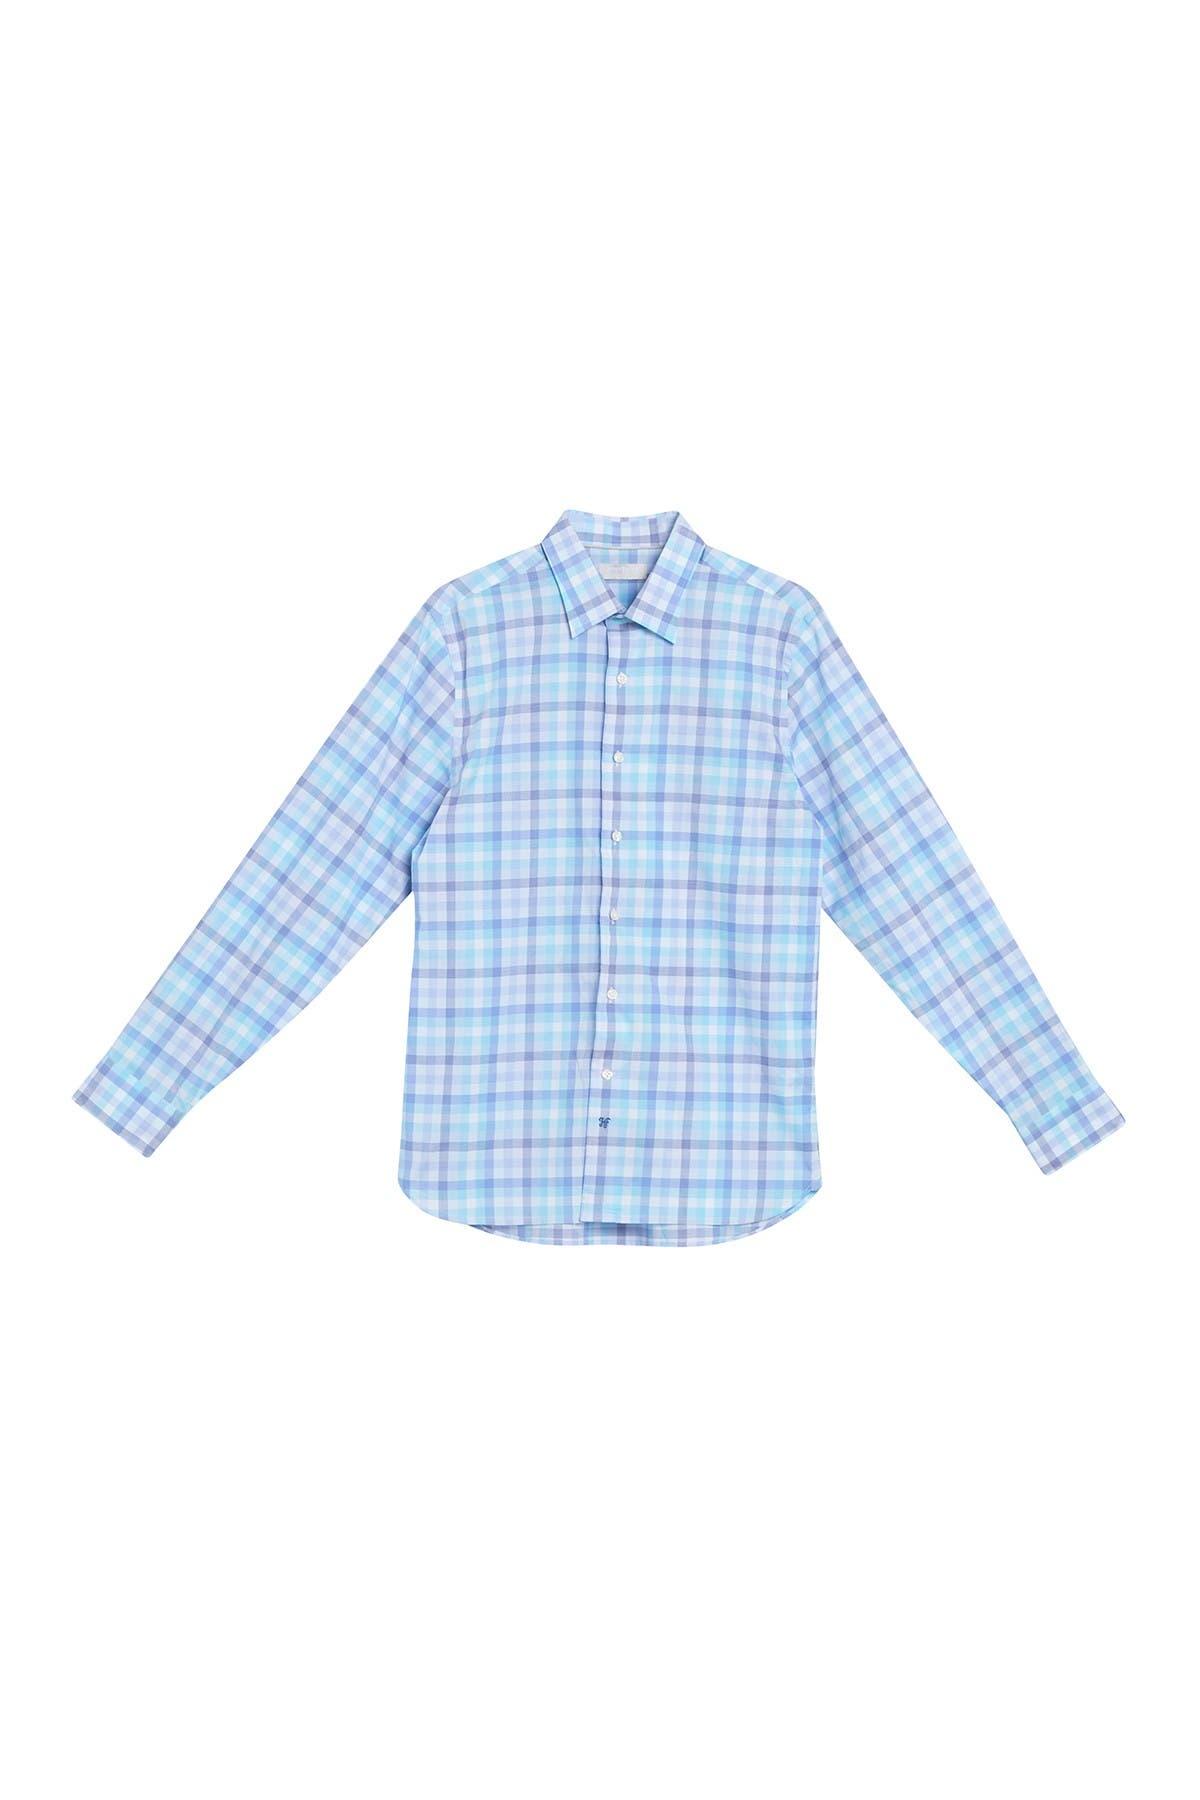 Image of Hickey Freeman Plaid Christopher Shirt